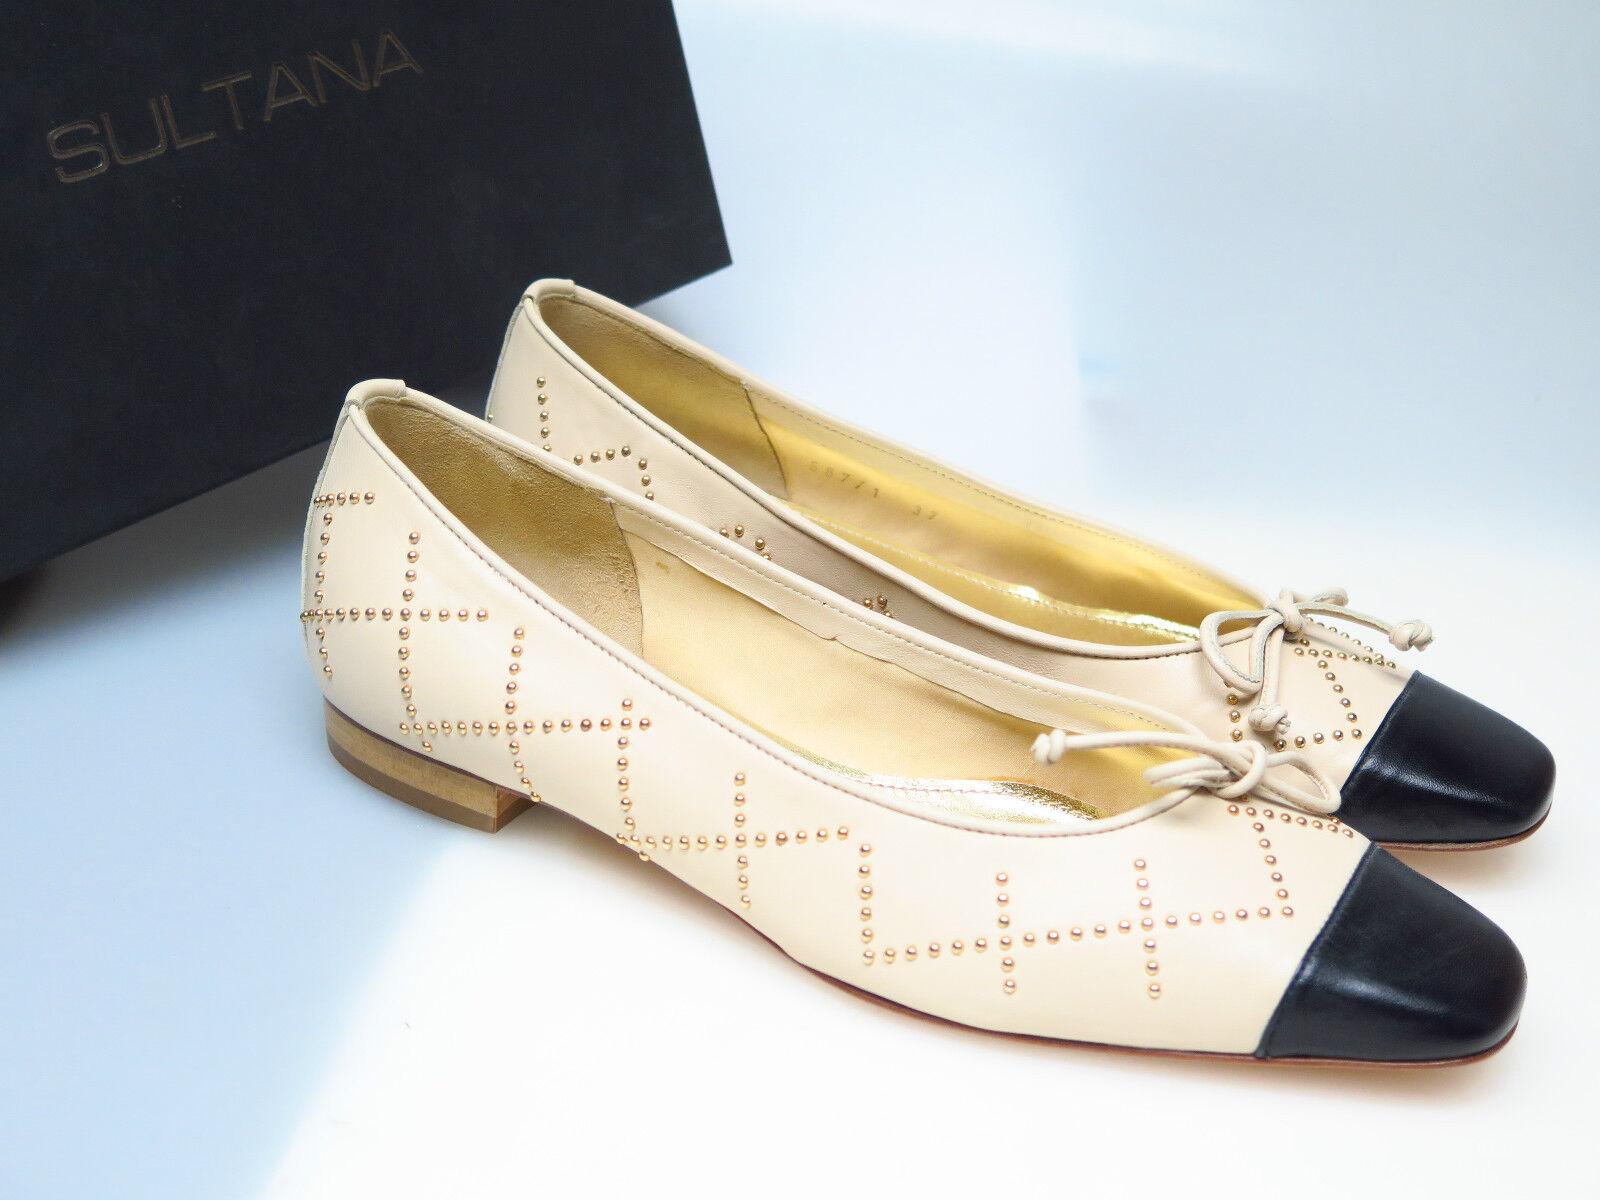 Descuento barato SULTANA Schuhe Designer Damenschuhe N4346 Tati Nappa Beige Simona Gr. 37,5 NEU